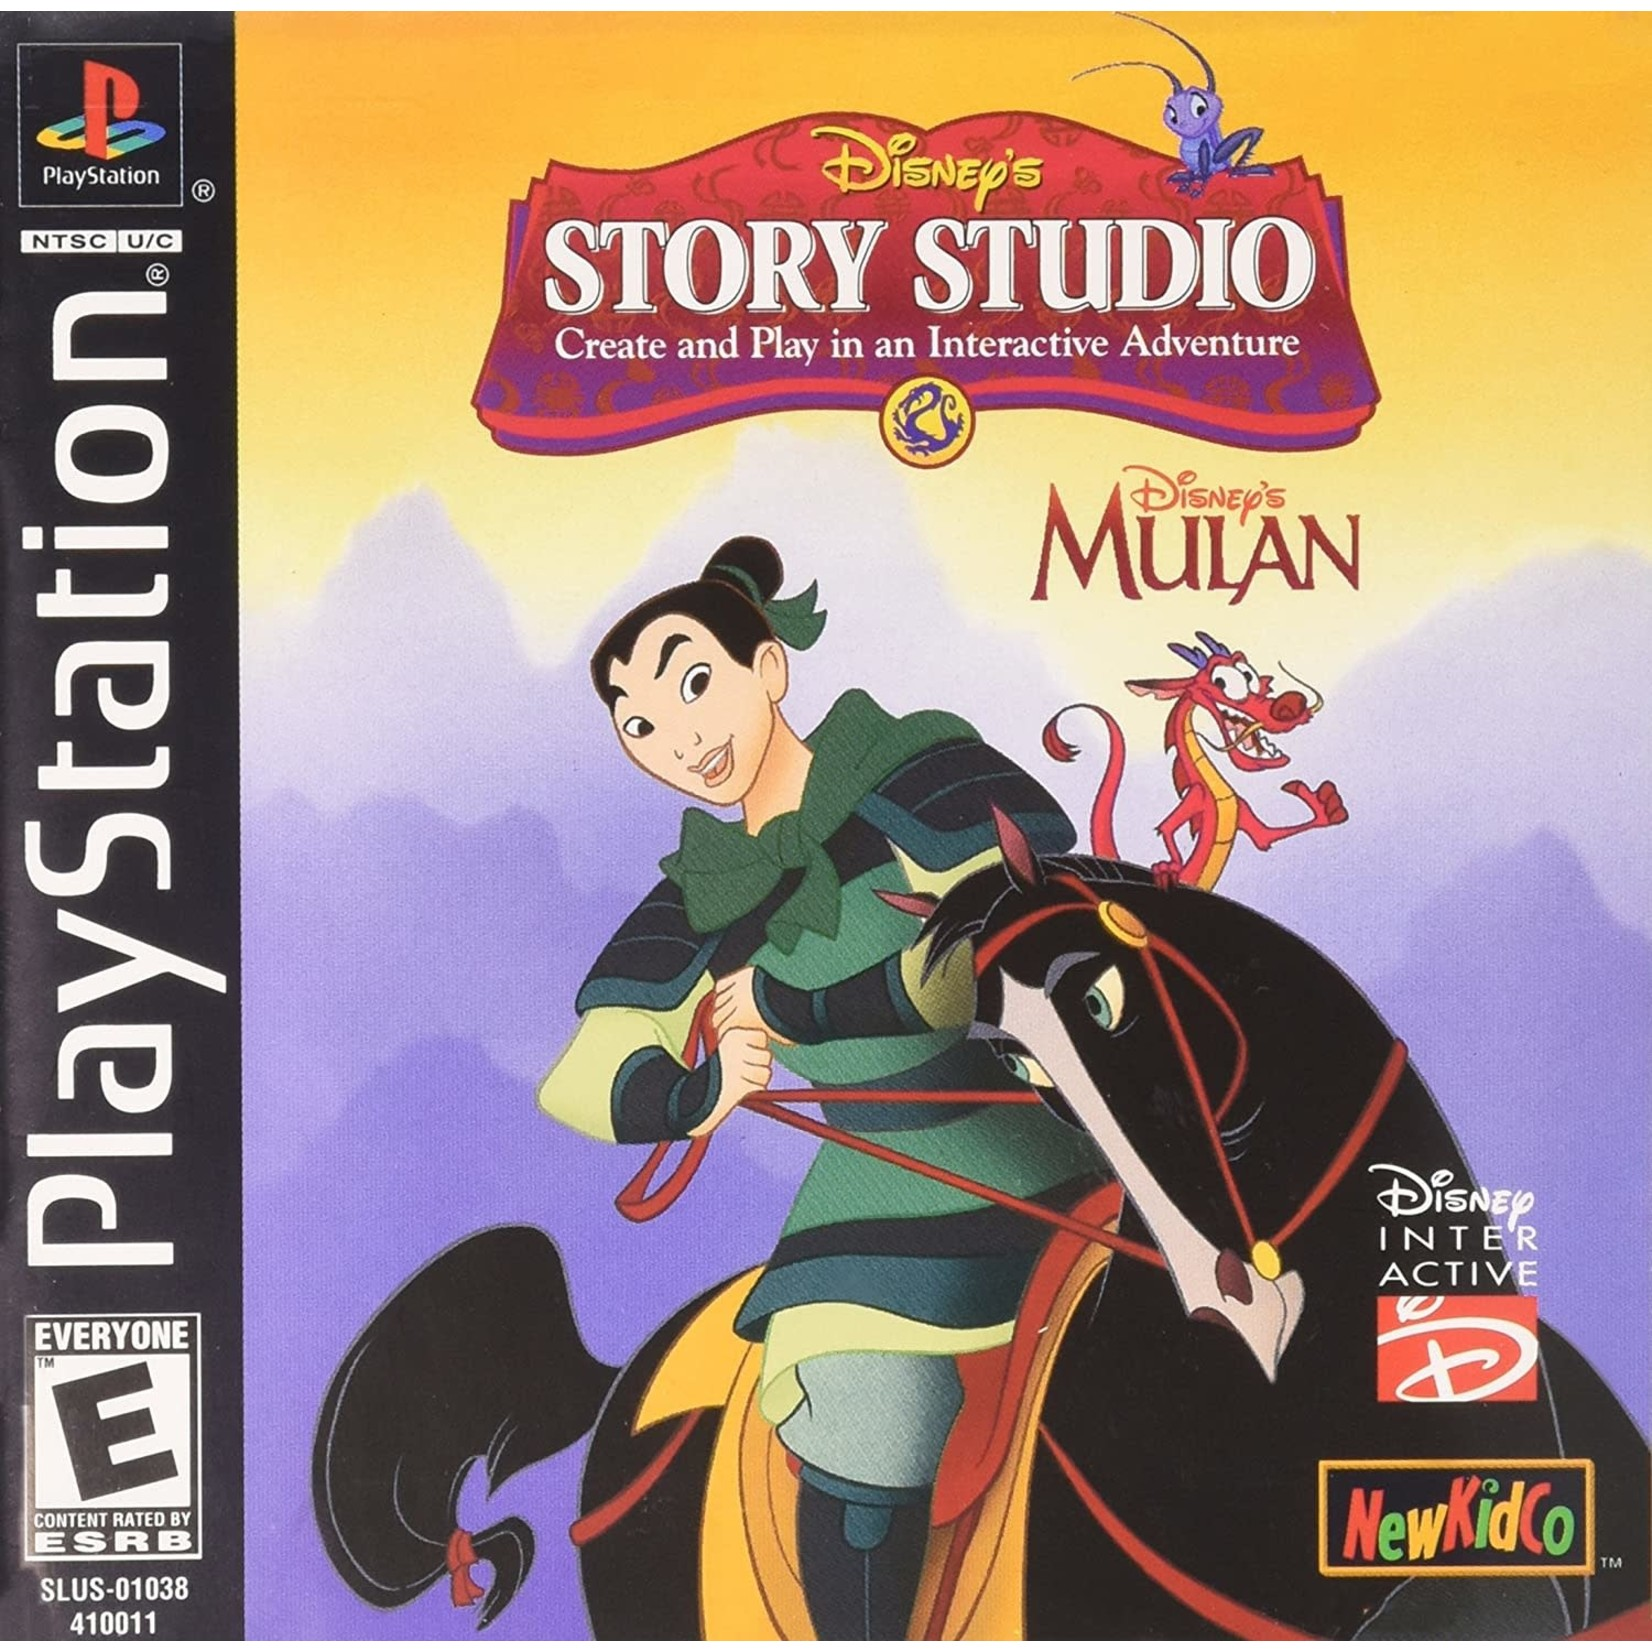 PS1U-Disney's Story Studio Mulan